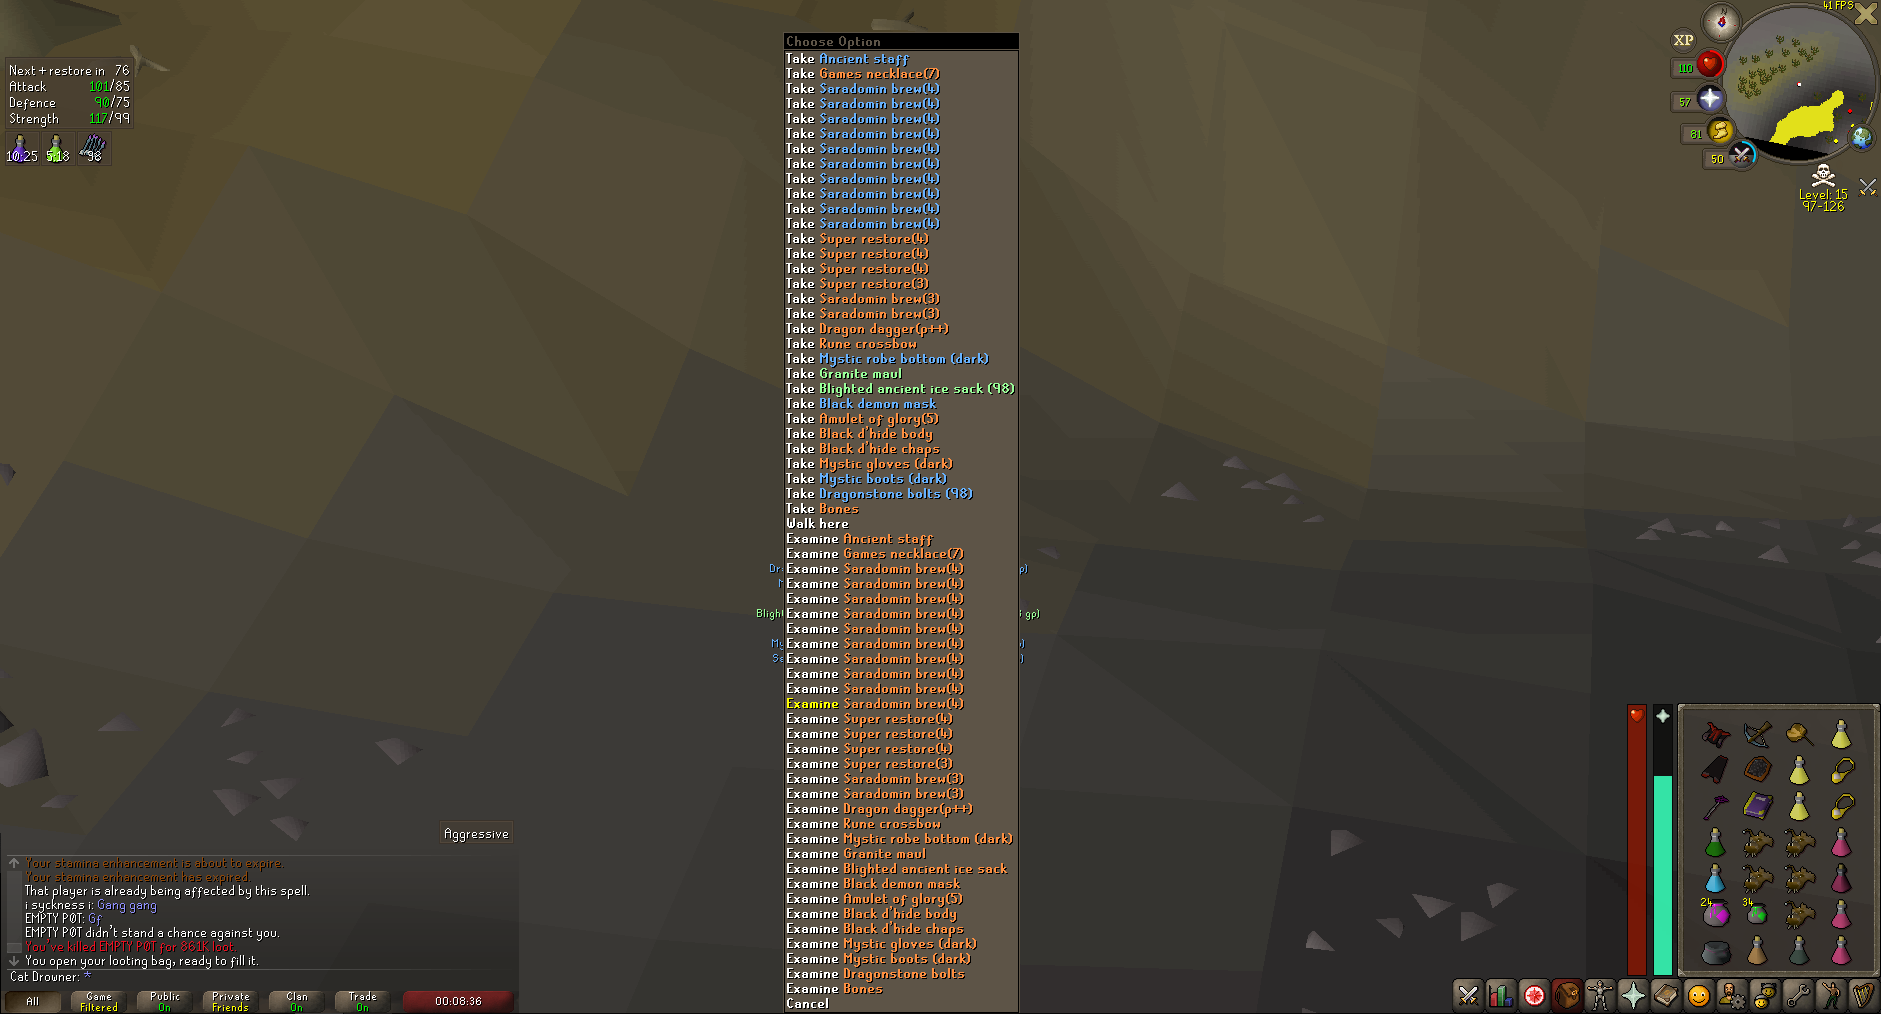 OpenOSRS_2uXz8xM041.png